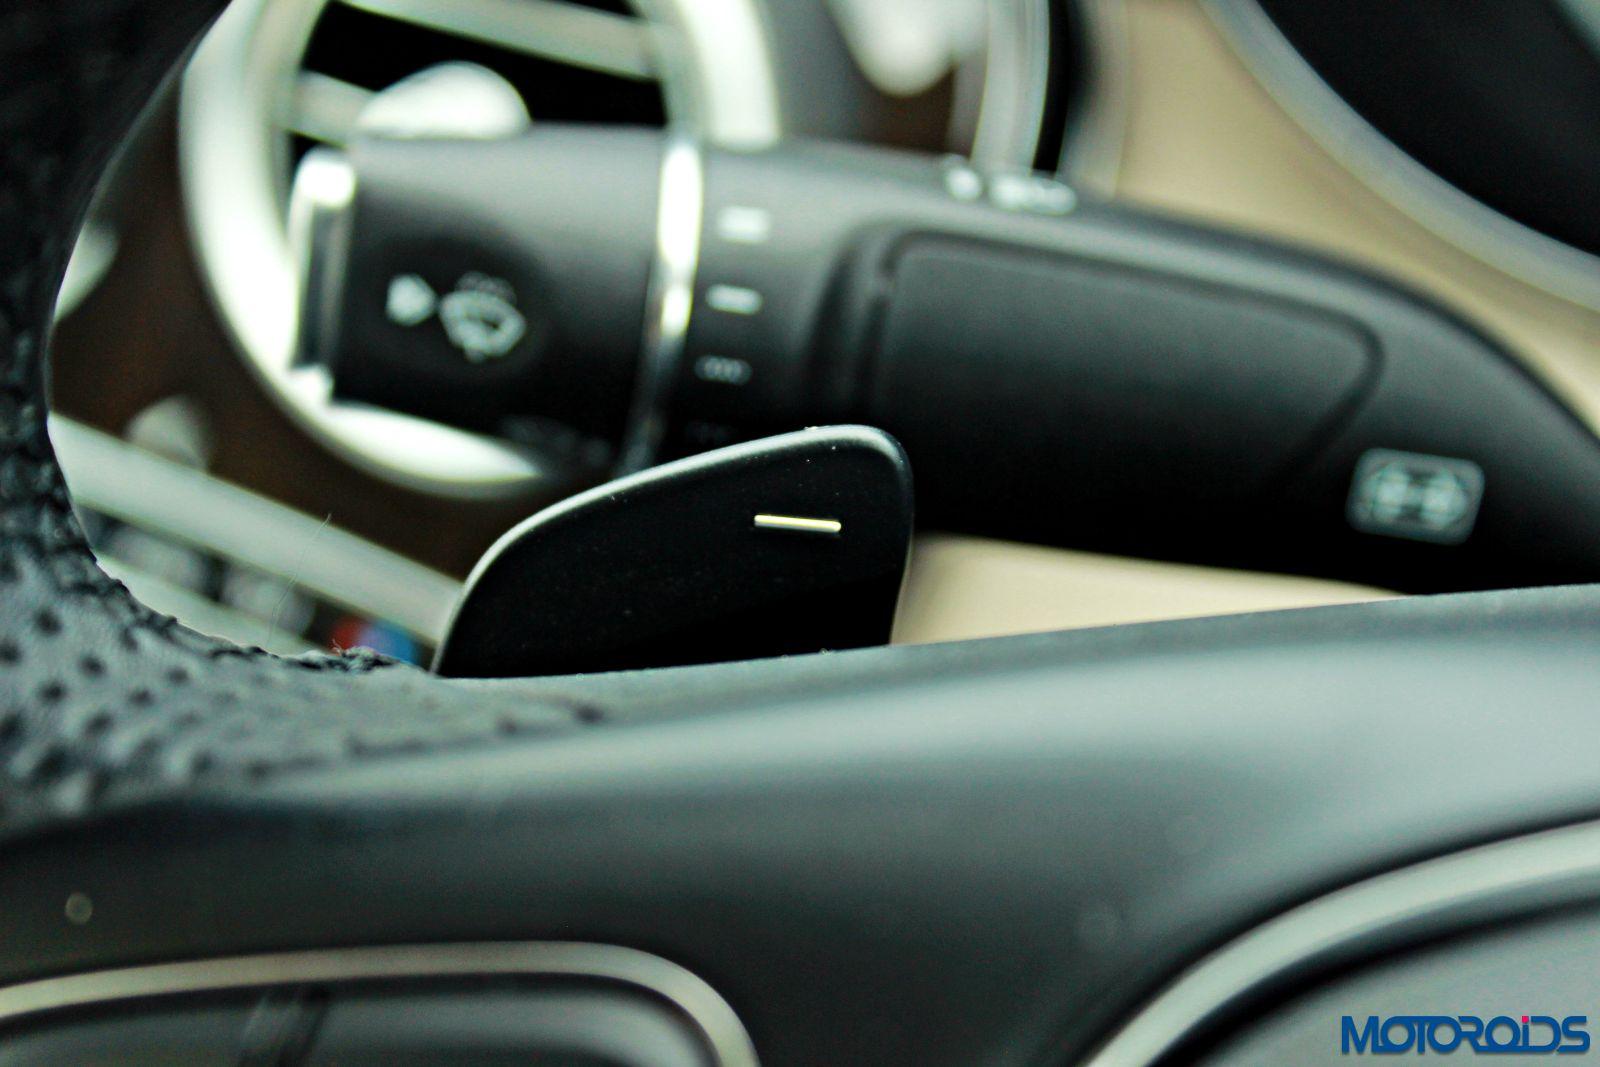 New 2015 Mercedes C Class C220 Cdi Review Bantamweight Brilliance Motoroids